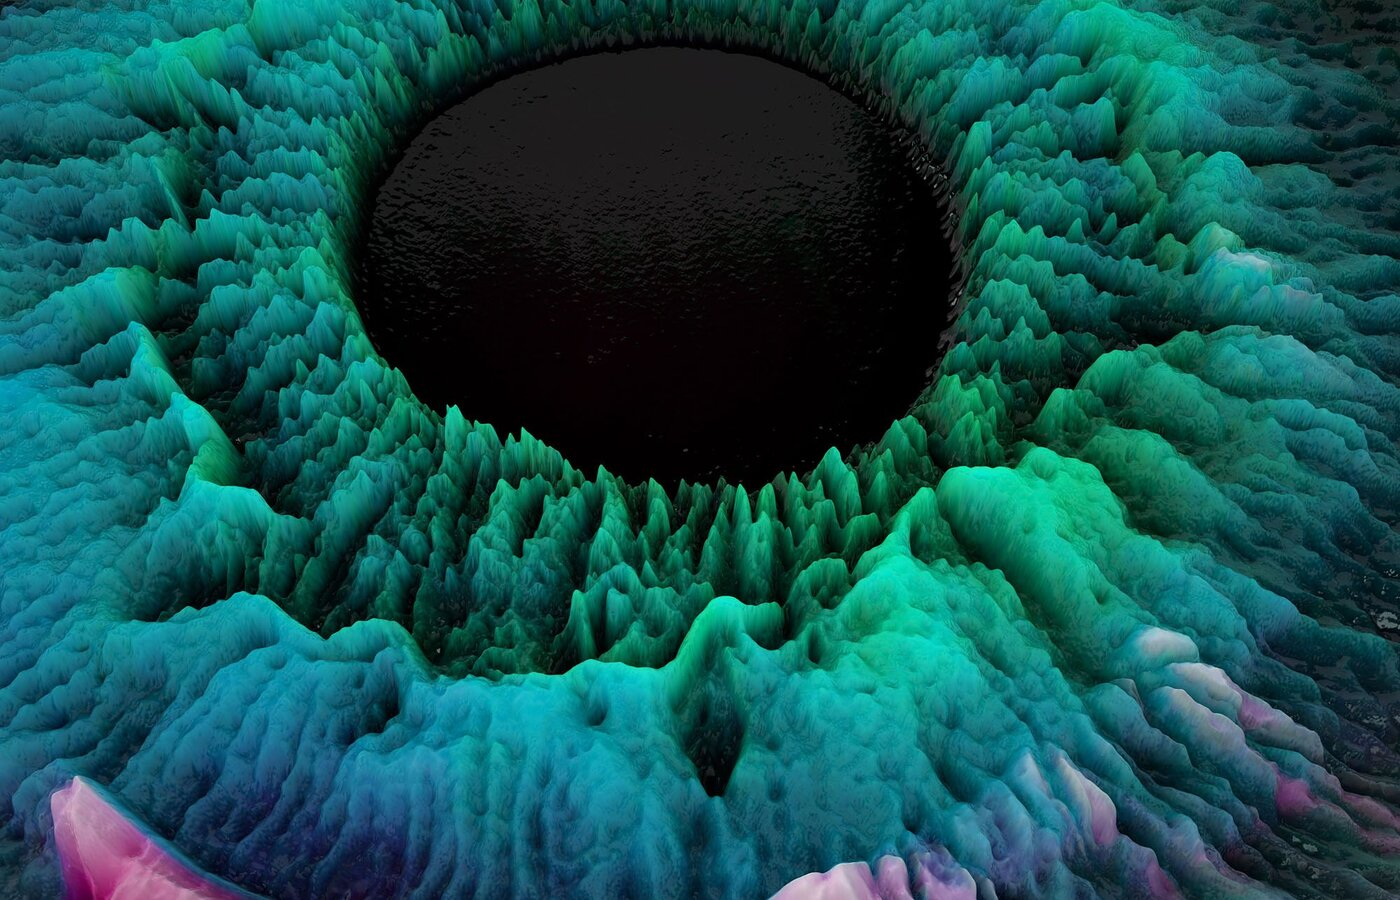 3d-fluid-glitch-textures-abstract-3s.jpg